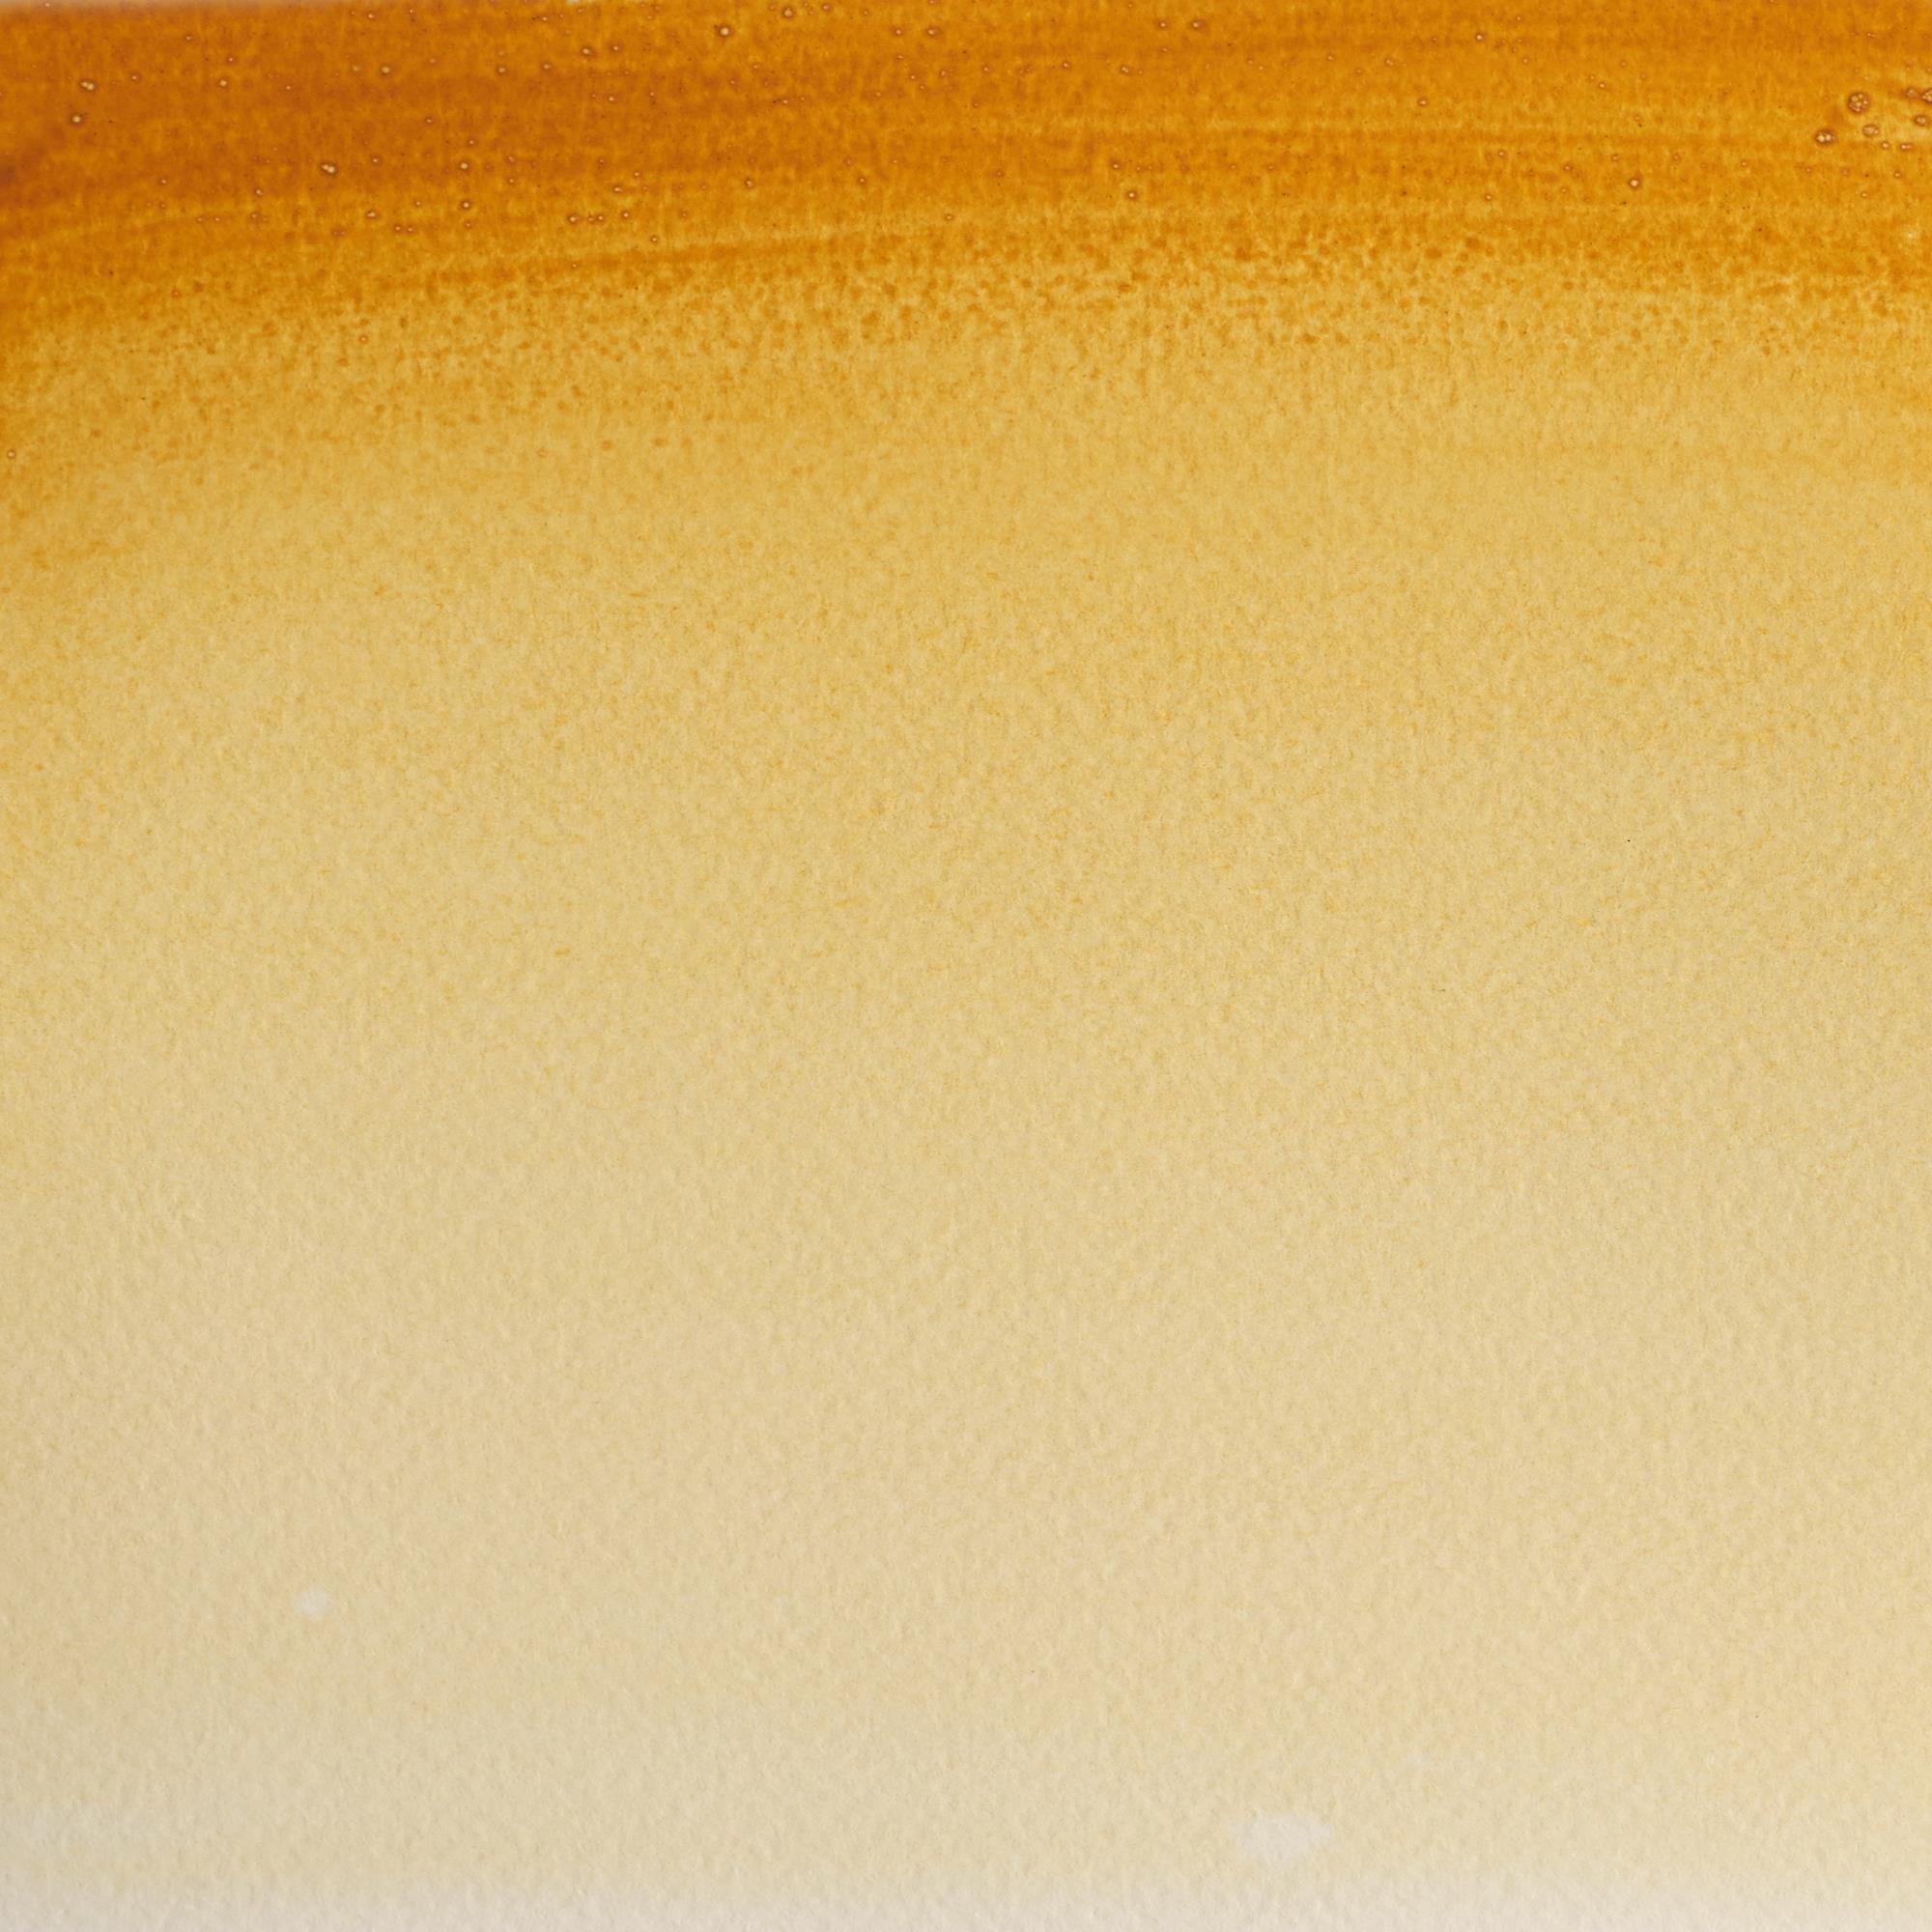 Cotman Watercolor Paint 8ml/Tube-Raw Sienna